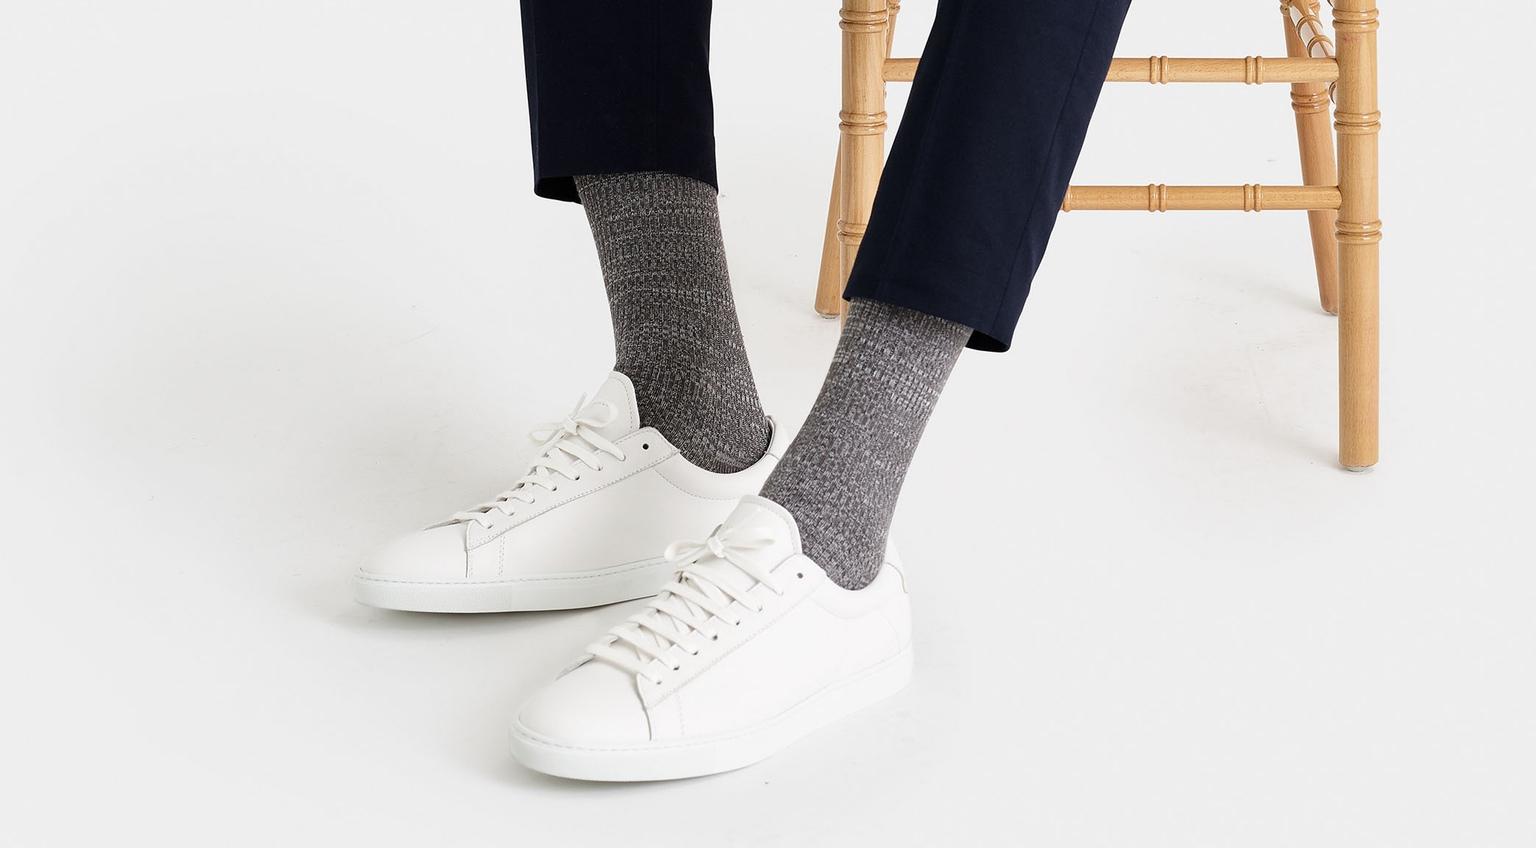 vince slater nubuck sneakers